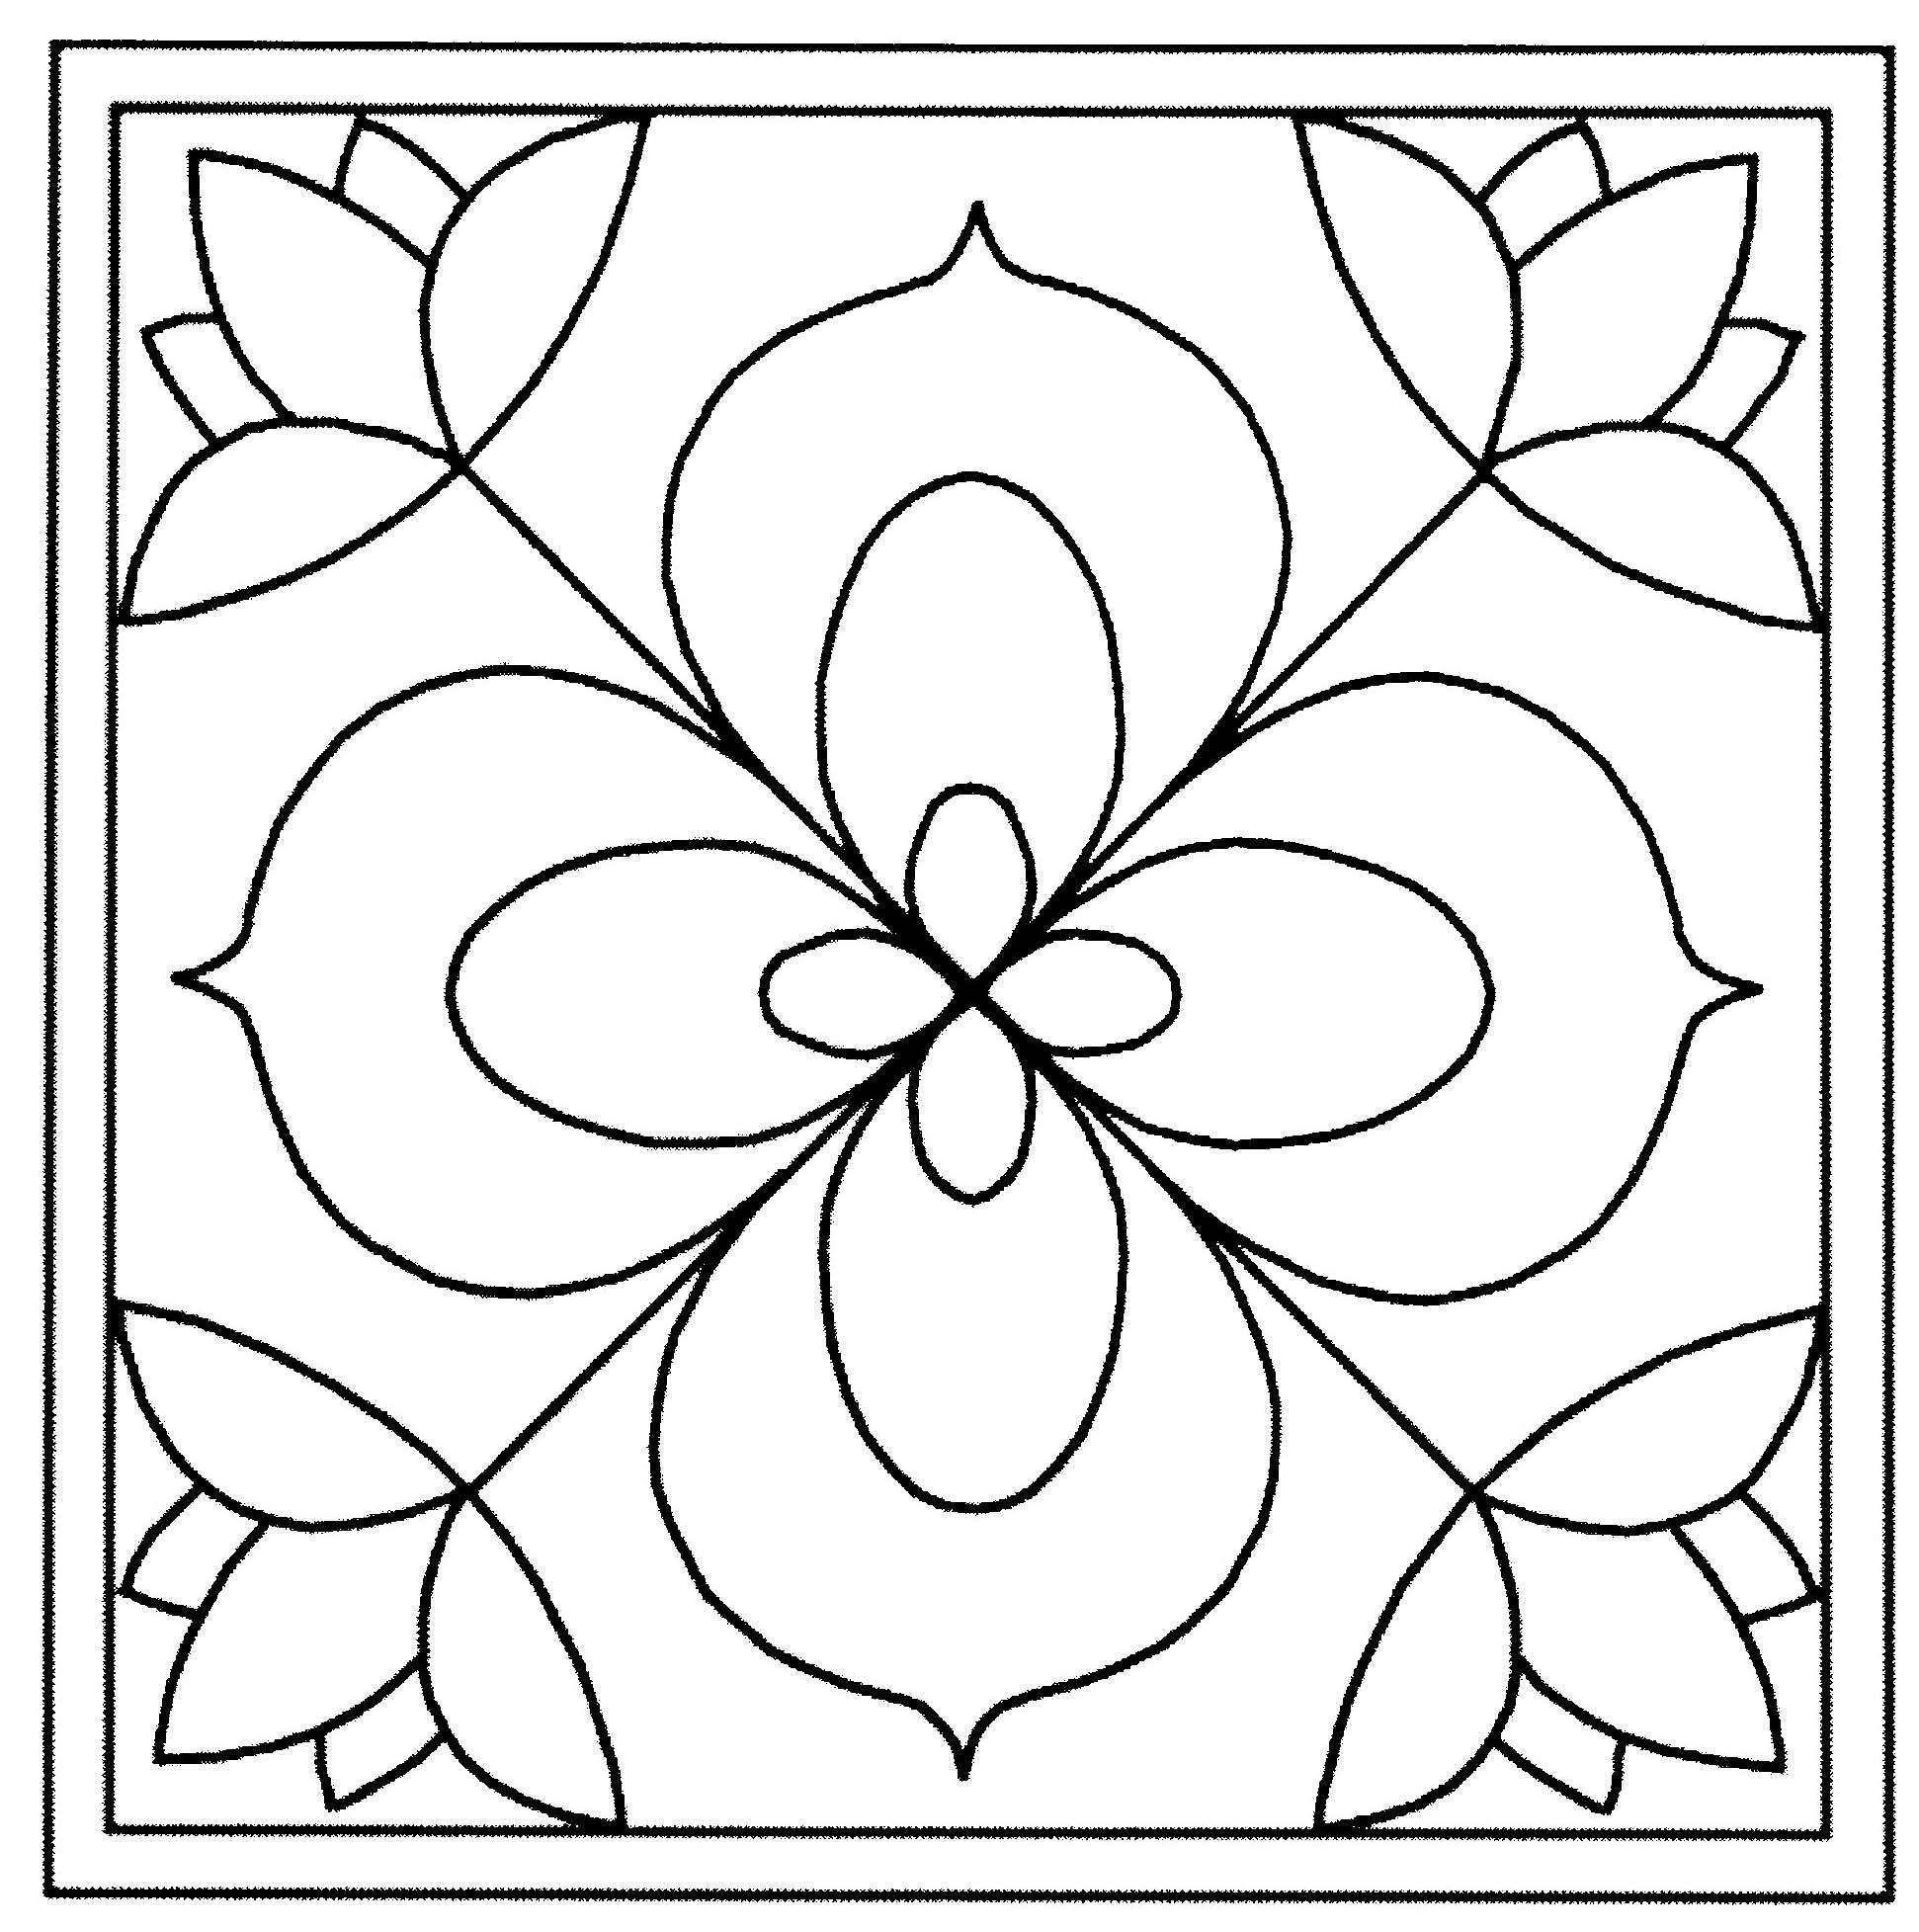 Coloriage Carreau Fleur